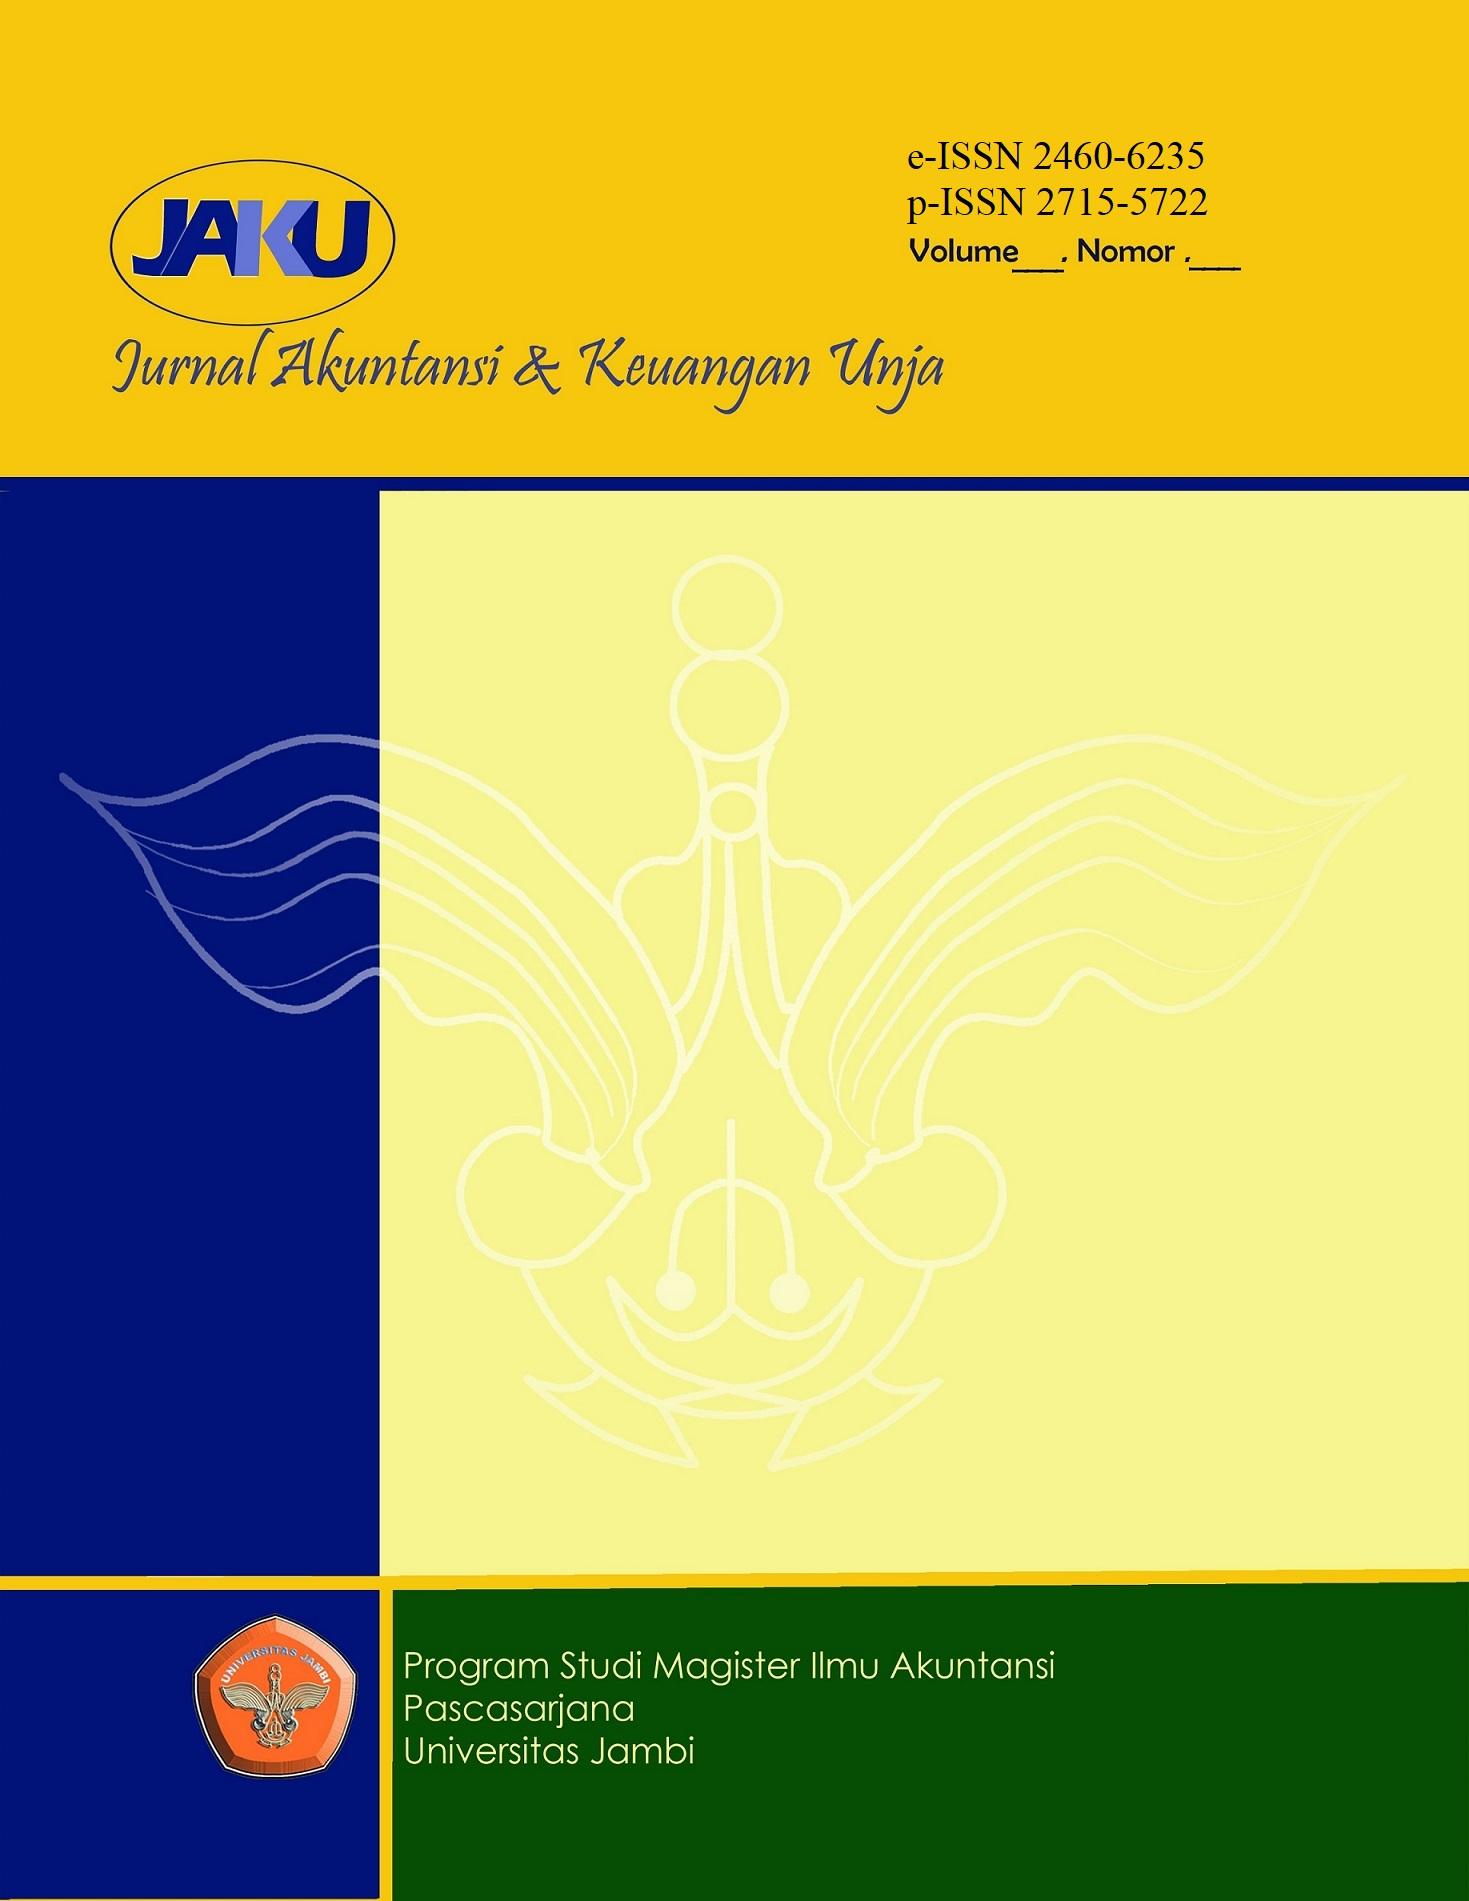 COVER JAKU